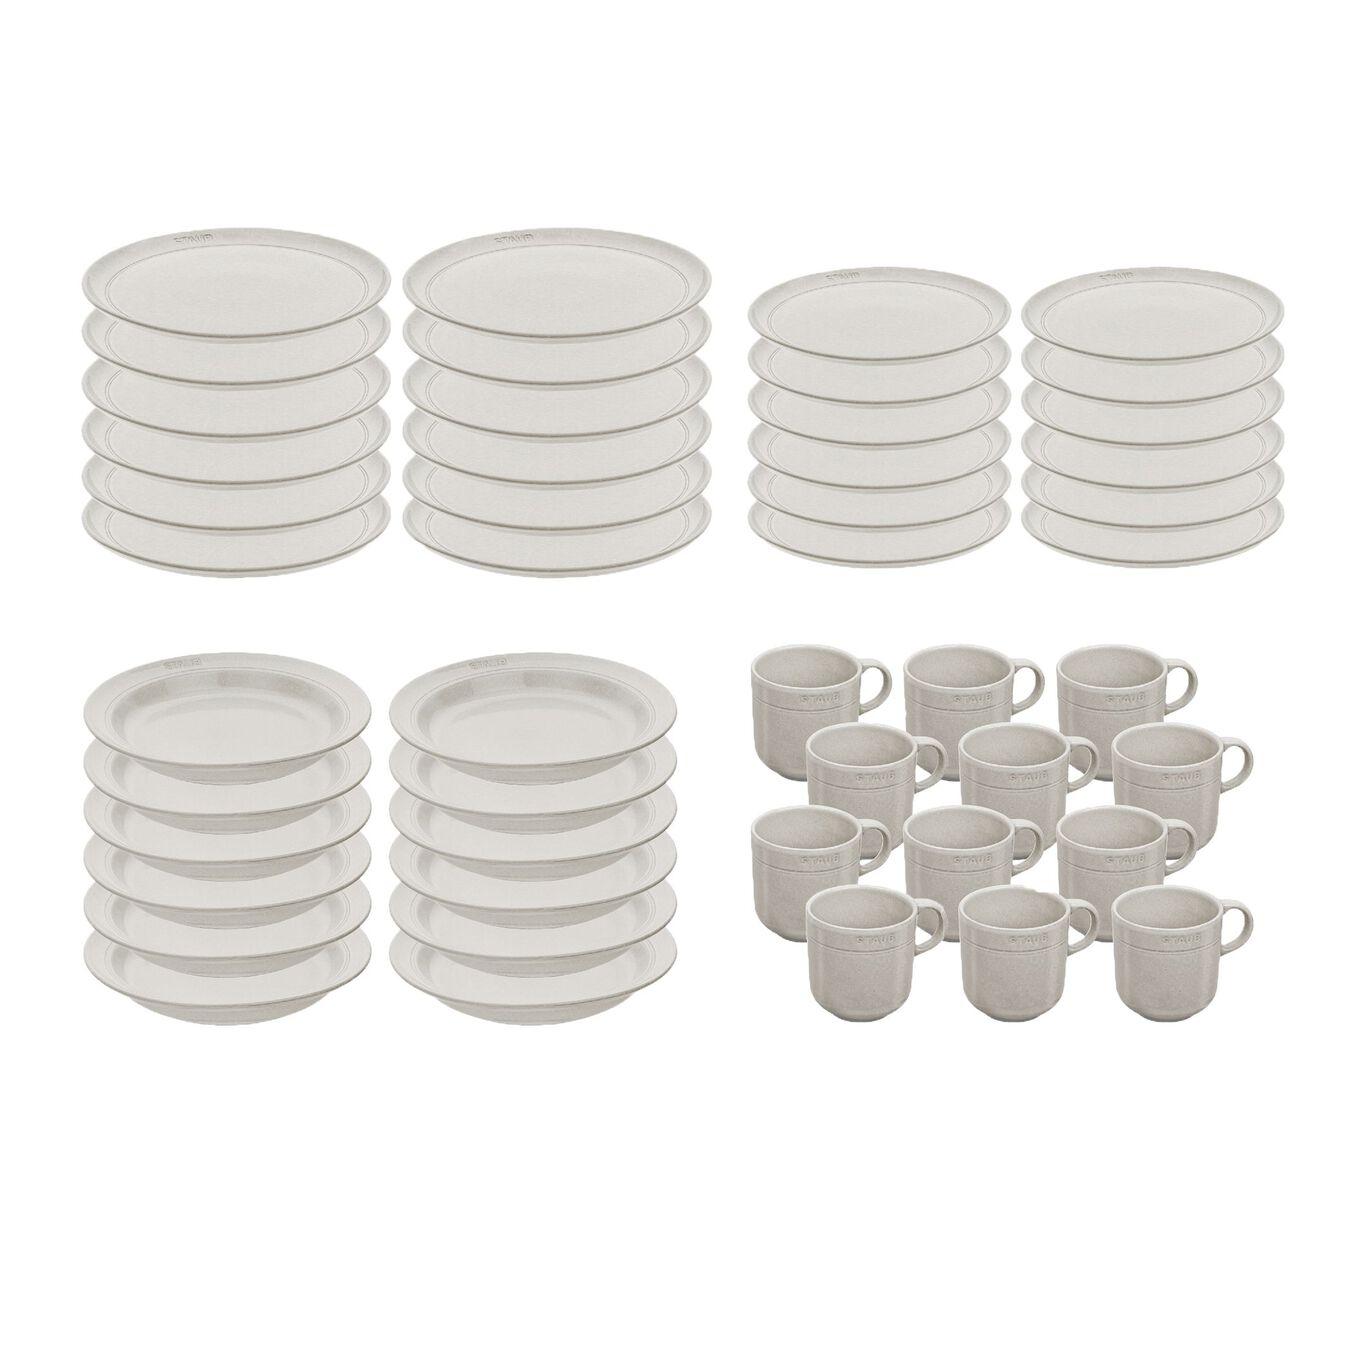 Serving set, 48 Piece | white truffle | Ceramic | Ceramic,,large 2